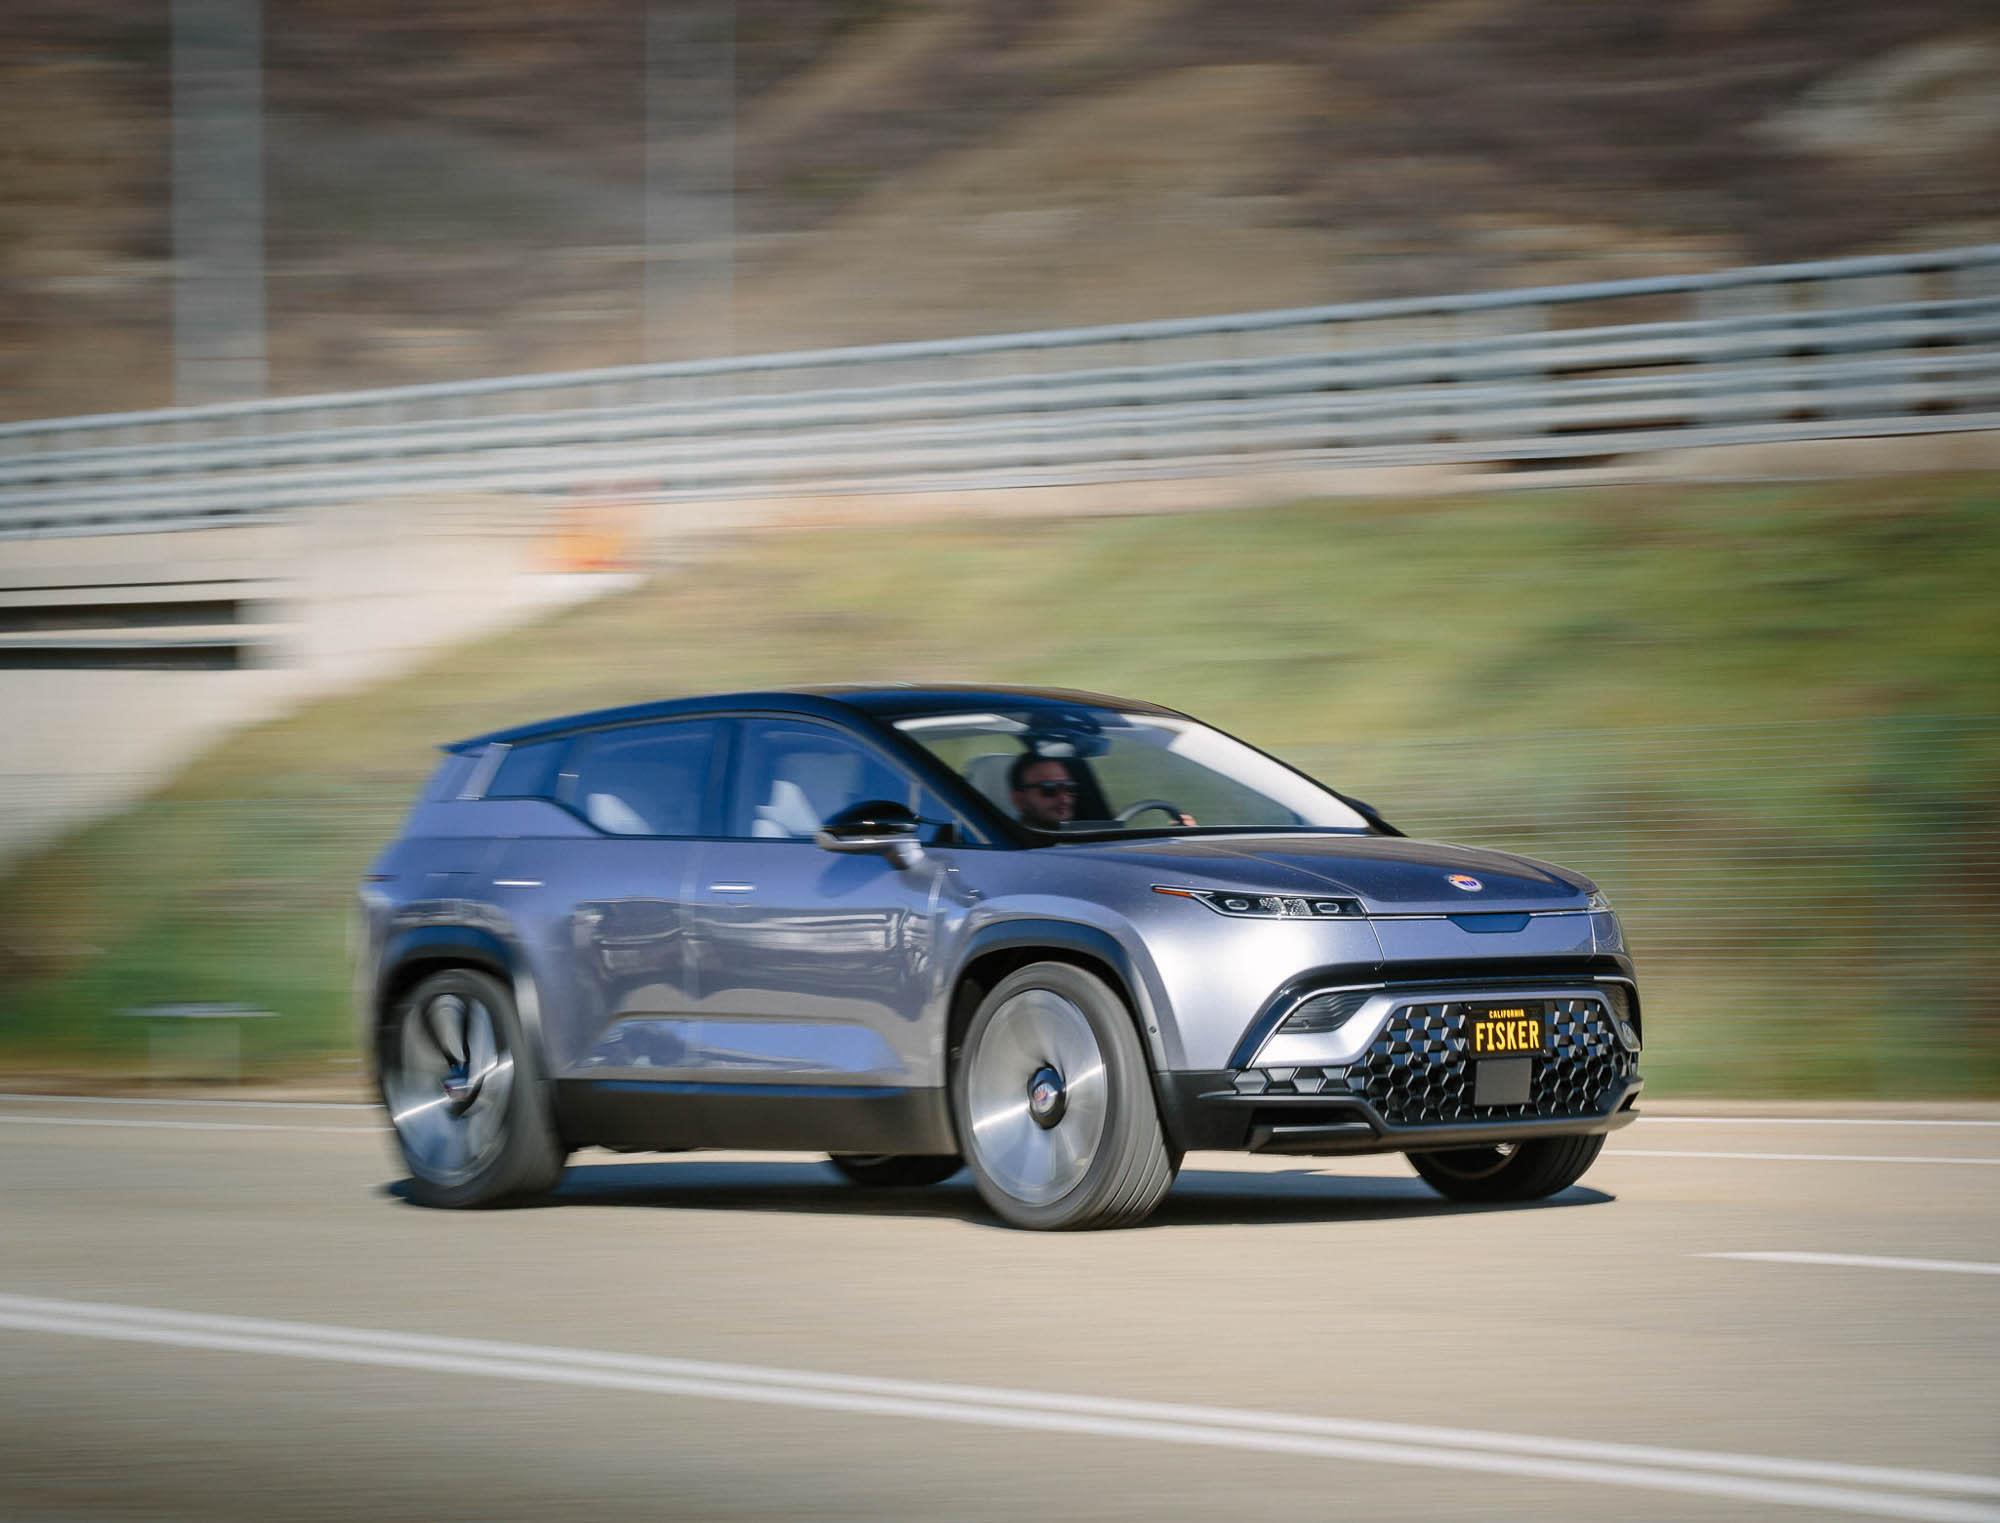 Apple supplier Foxconn reaches tentative agreement to build Fisker's next electric car